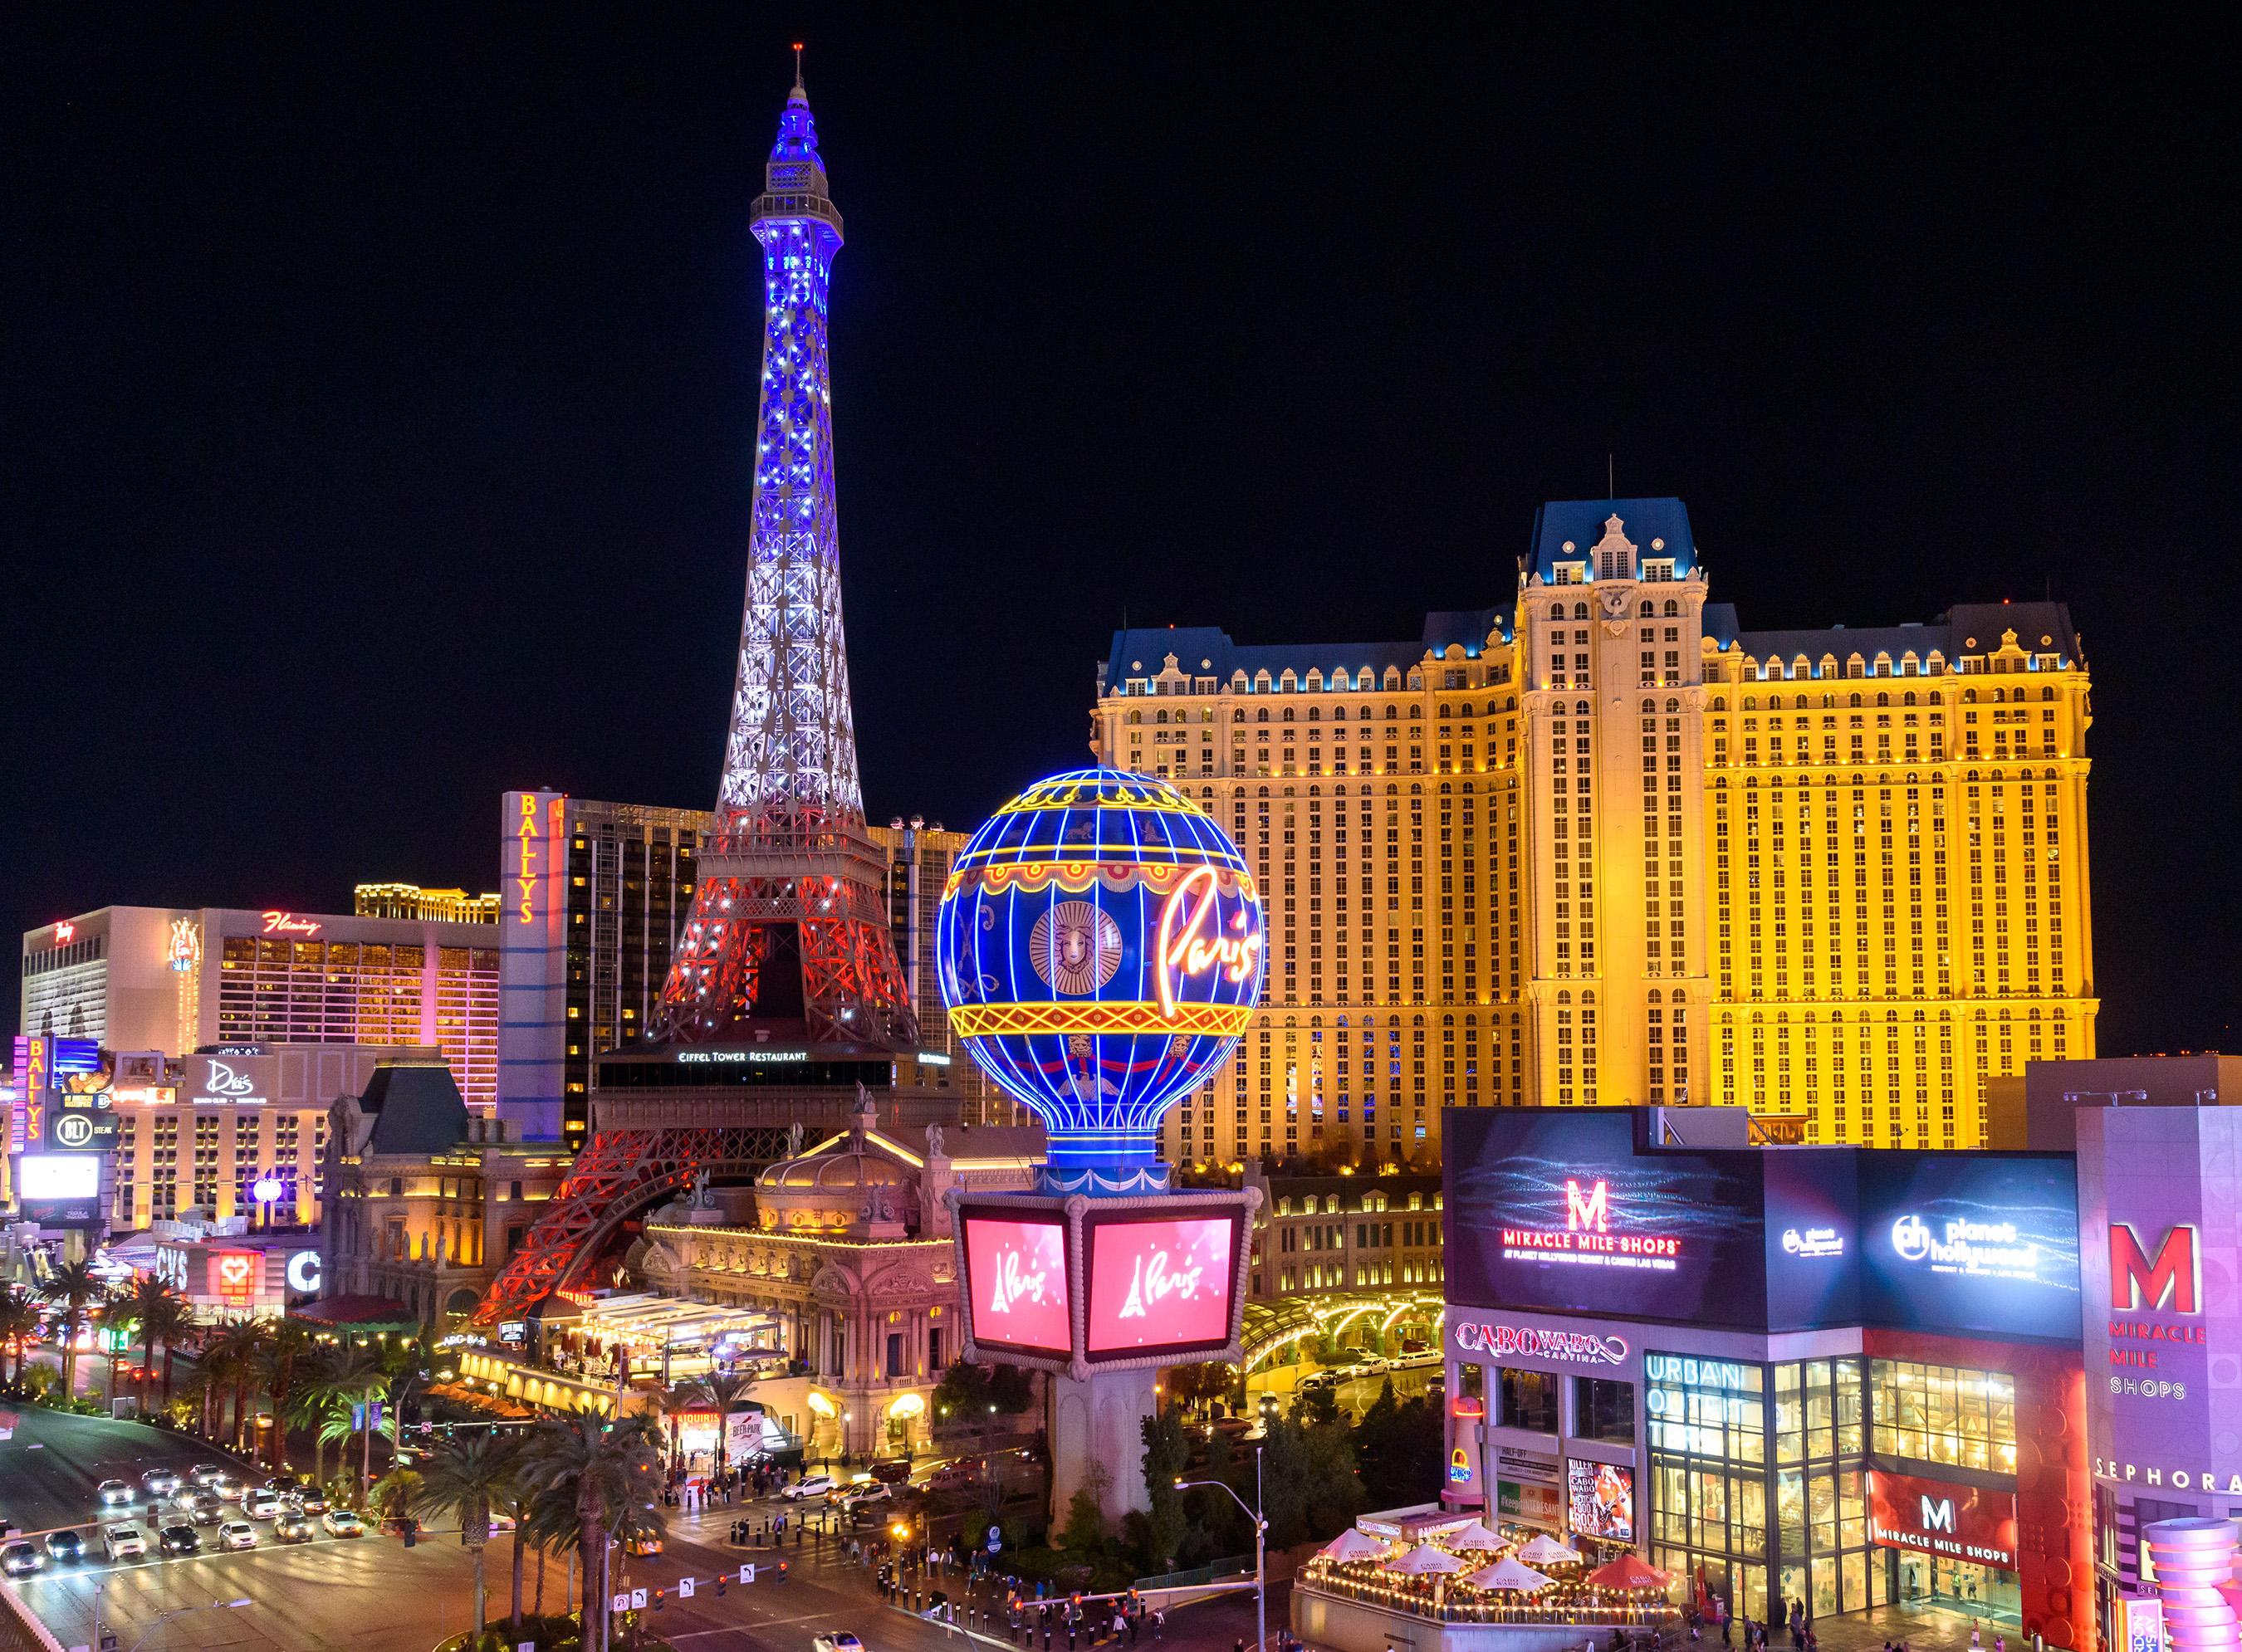 Paris Las Vegas debuts new $1.7 million Eiffel Tower light show. (Courtesy of Patrick Gray/KabikPhotoGroup.com)